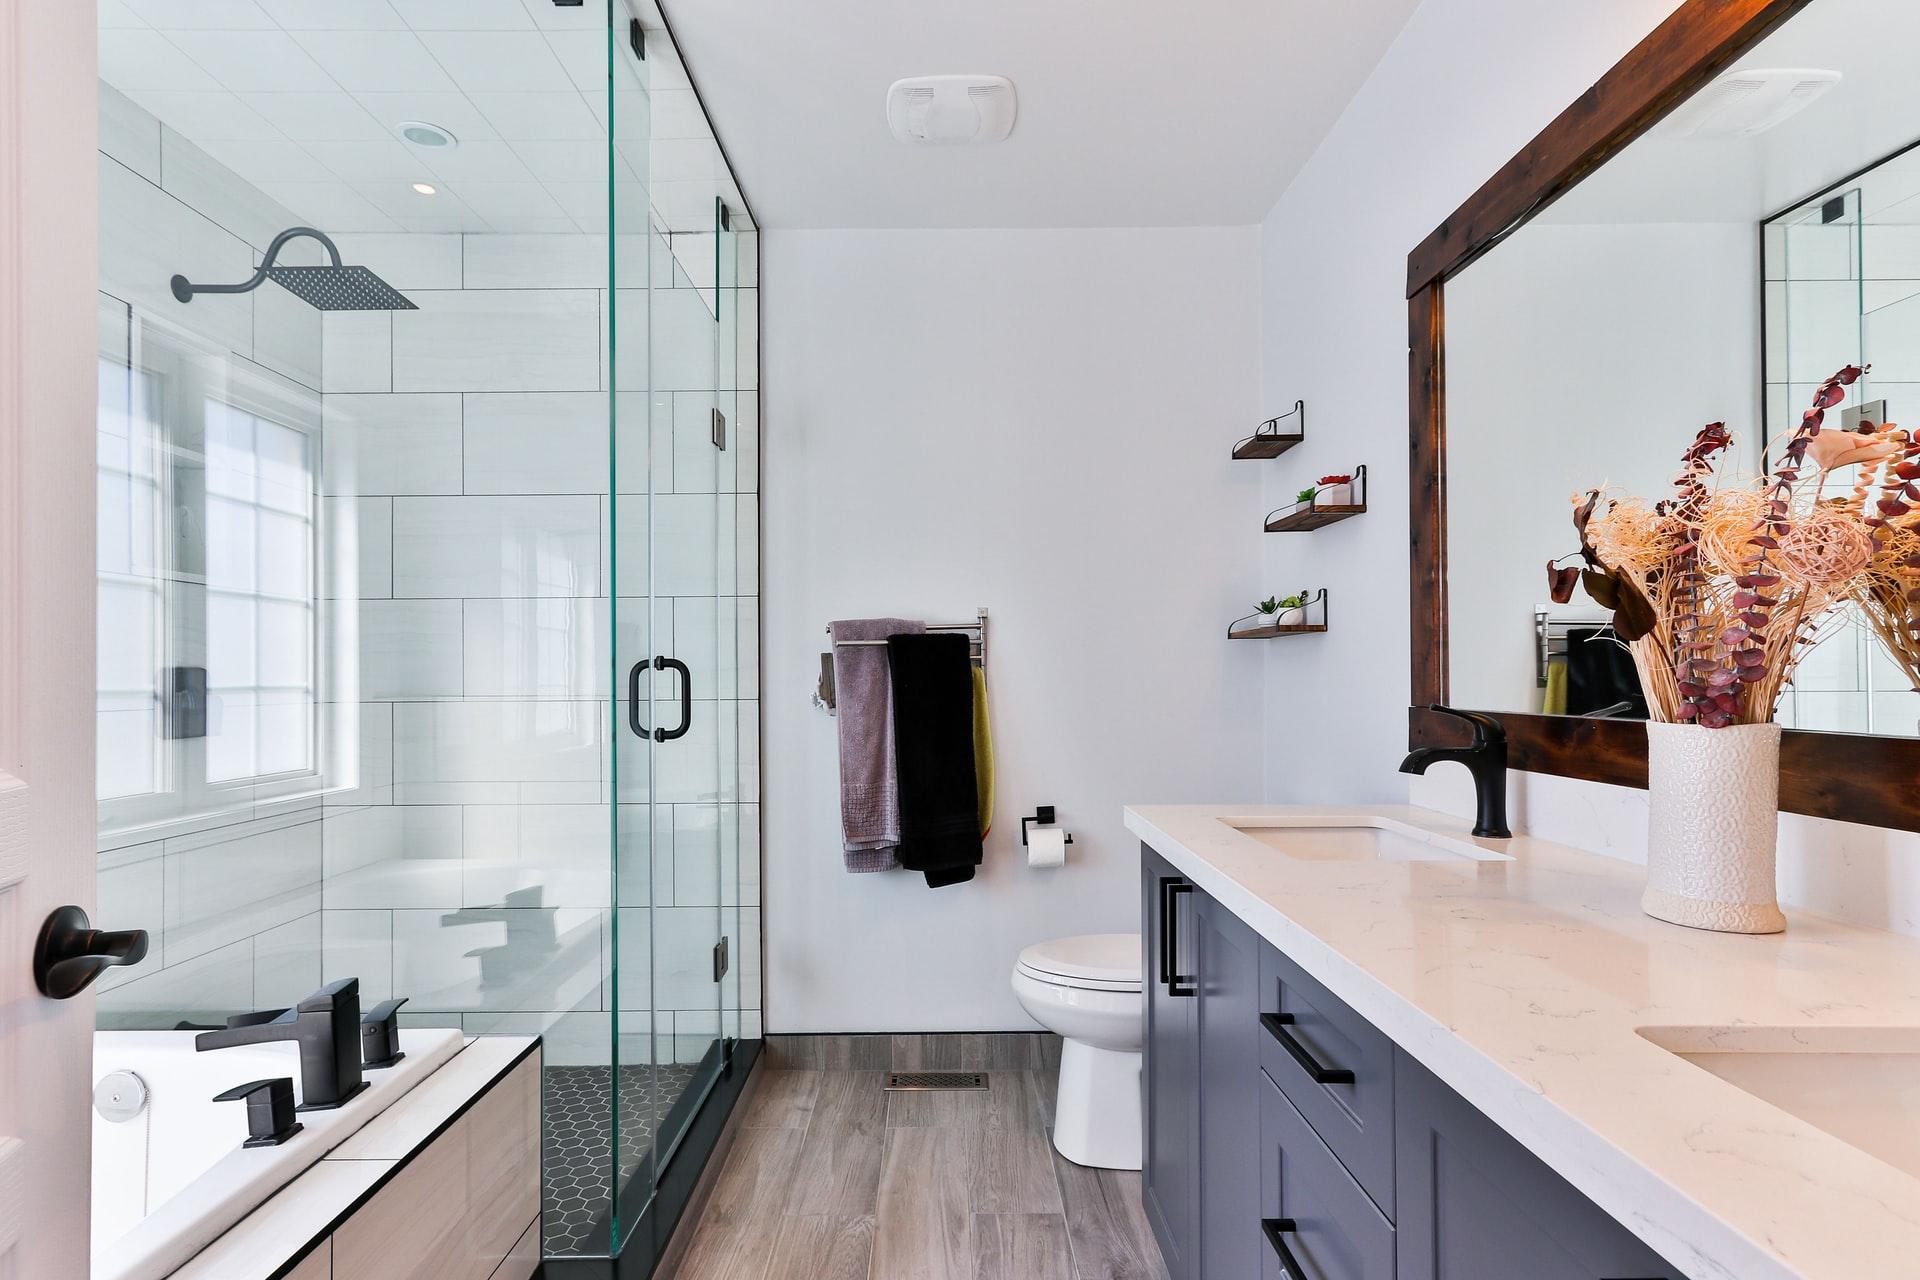 sidekix media g51F6 WYzyU unsplash 1 - Drømmer du om et nyt badeværelse?